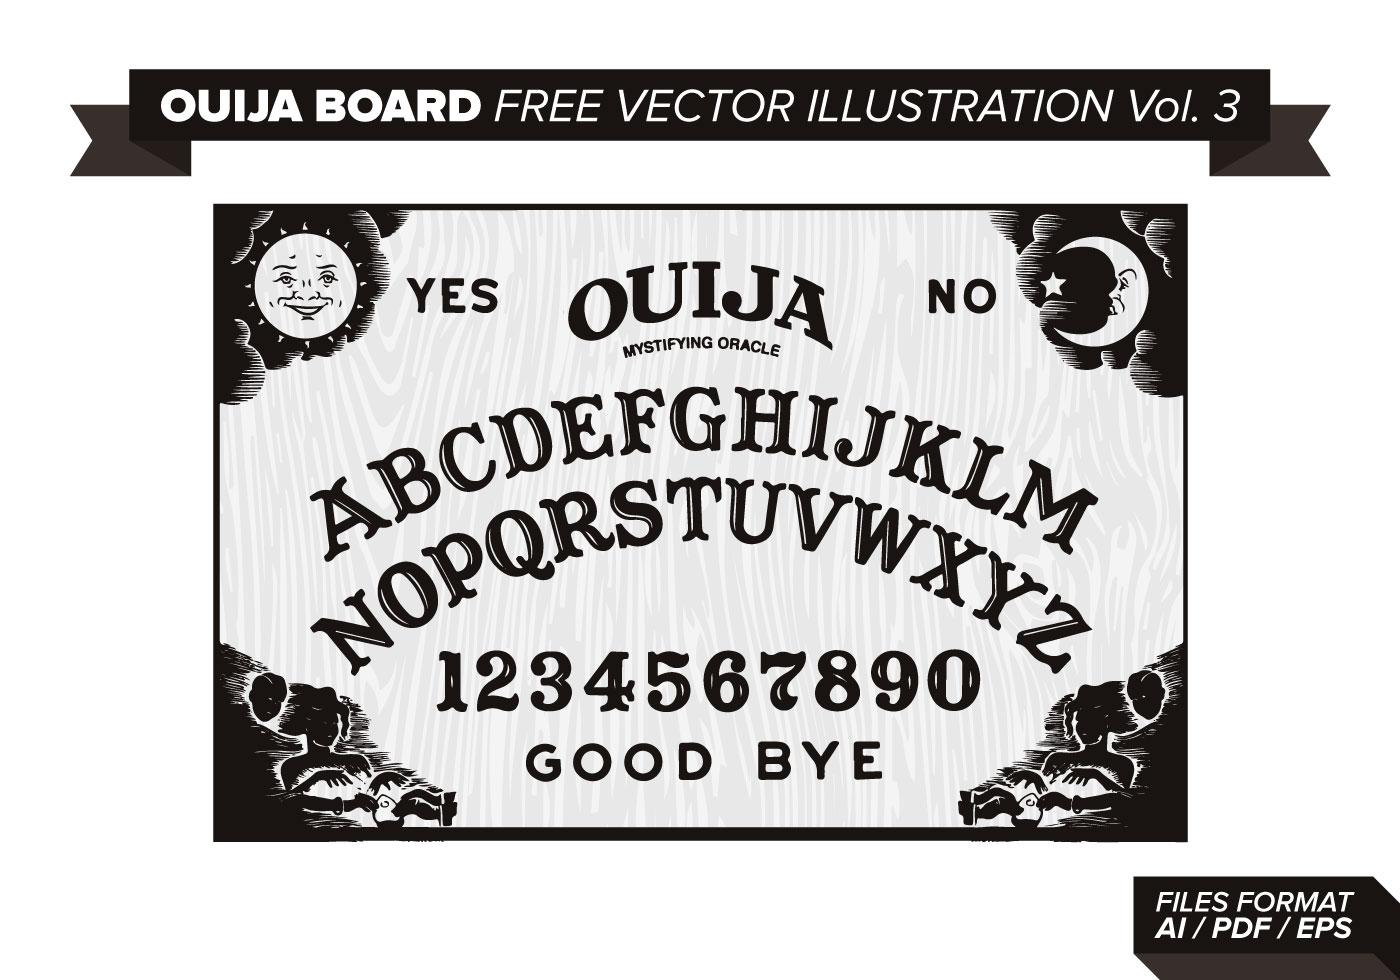 ouija board svg #219, Download drawings